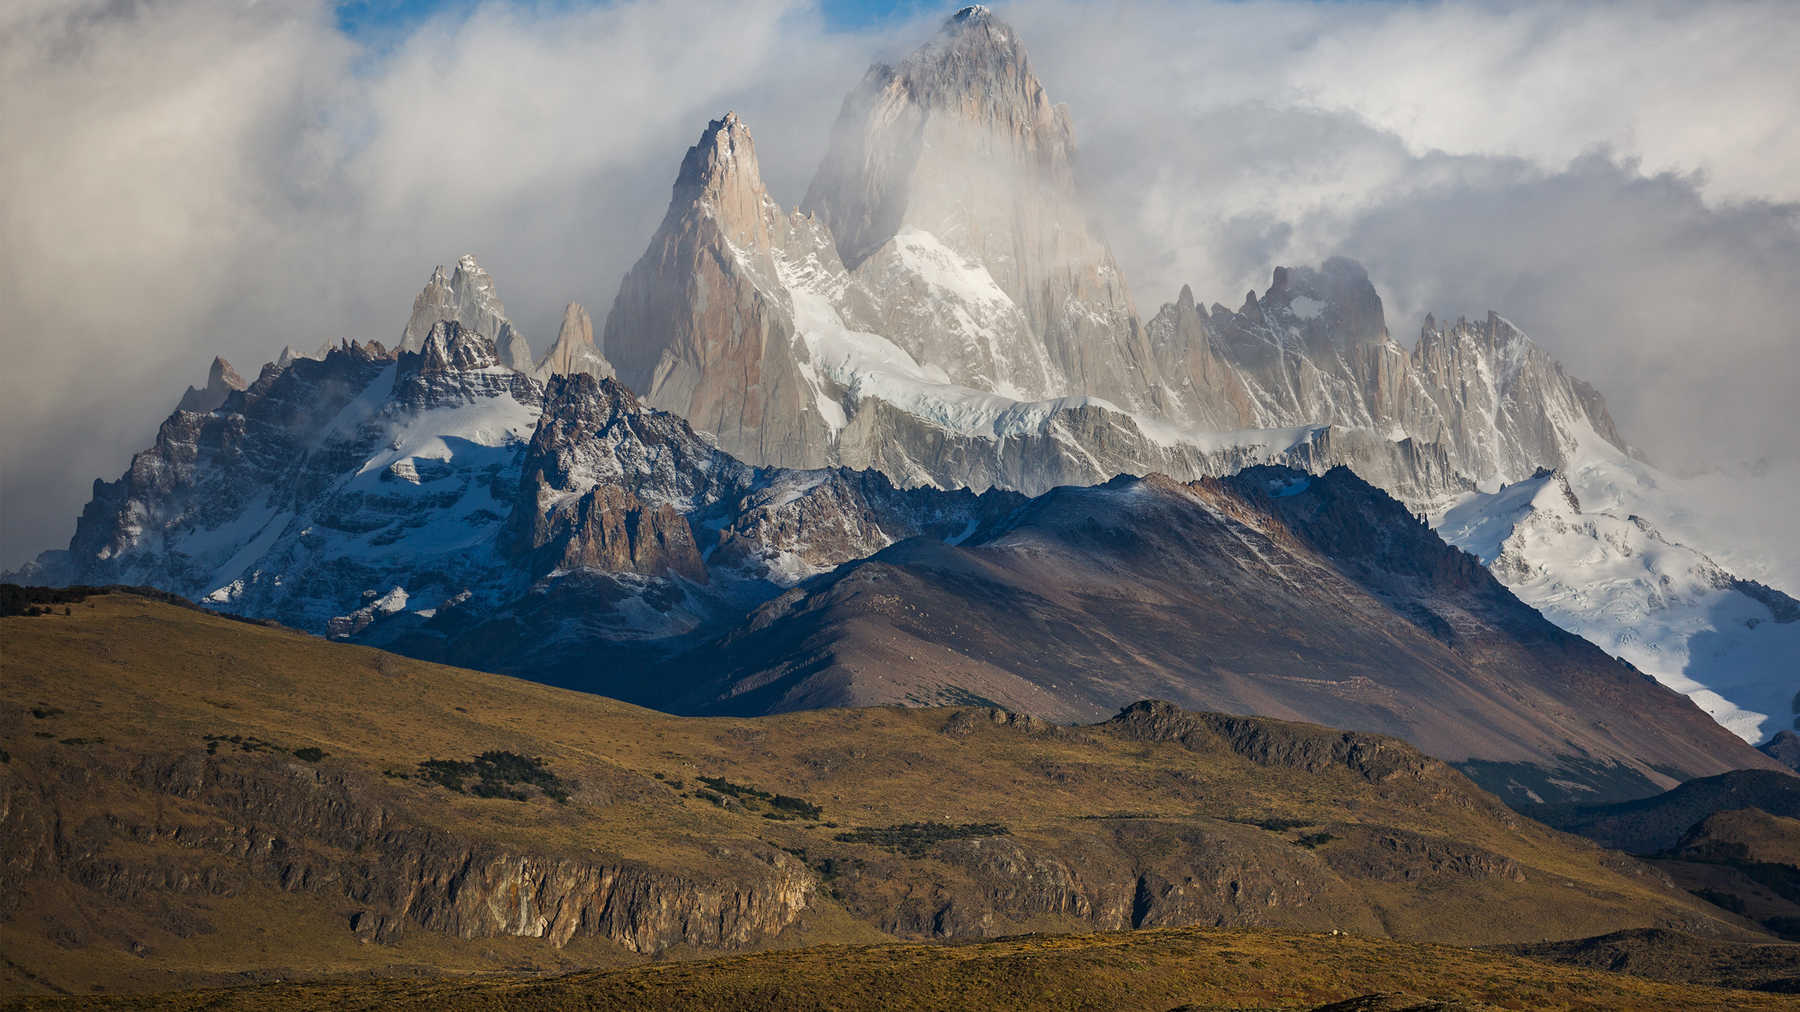 Patagonia Hiking El Calafate, El Chalten, Argentina